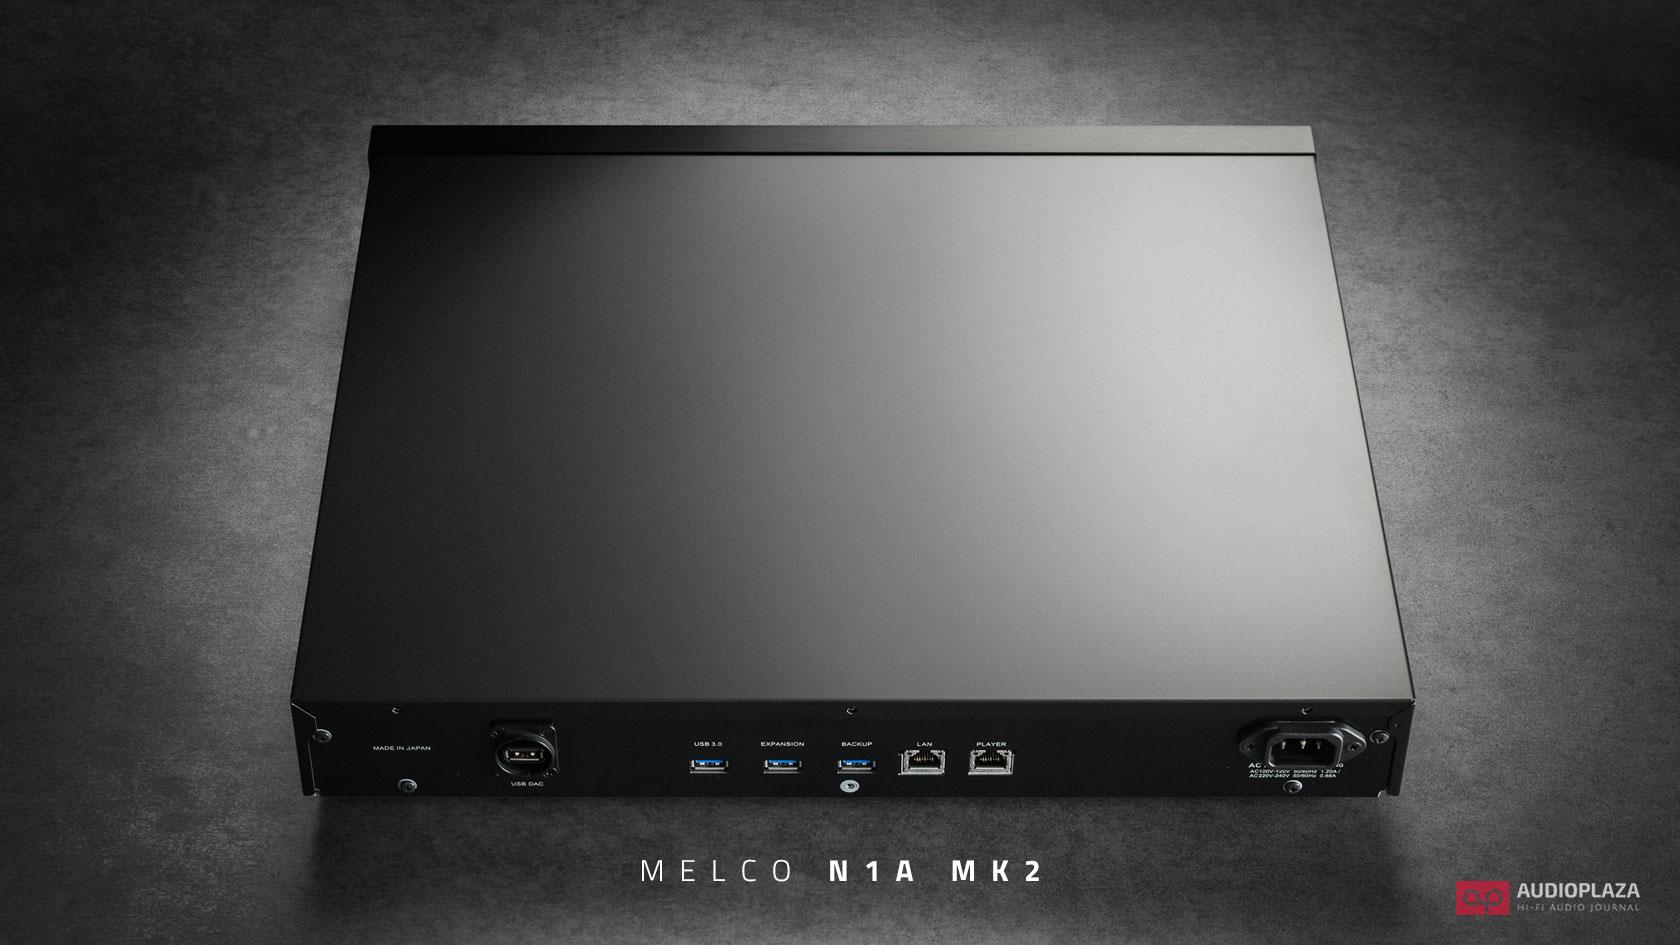 Melco N1AMK2